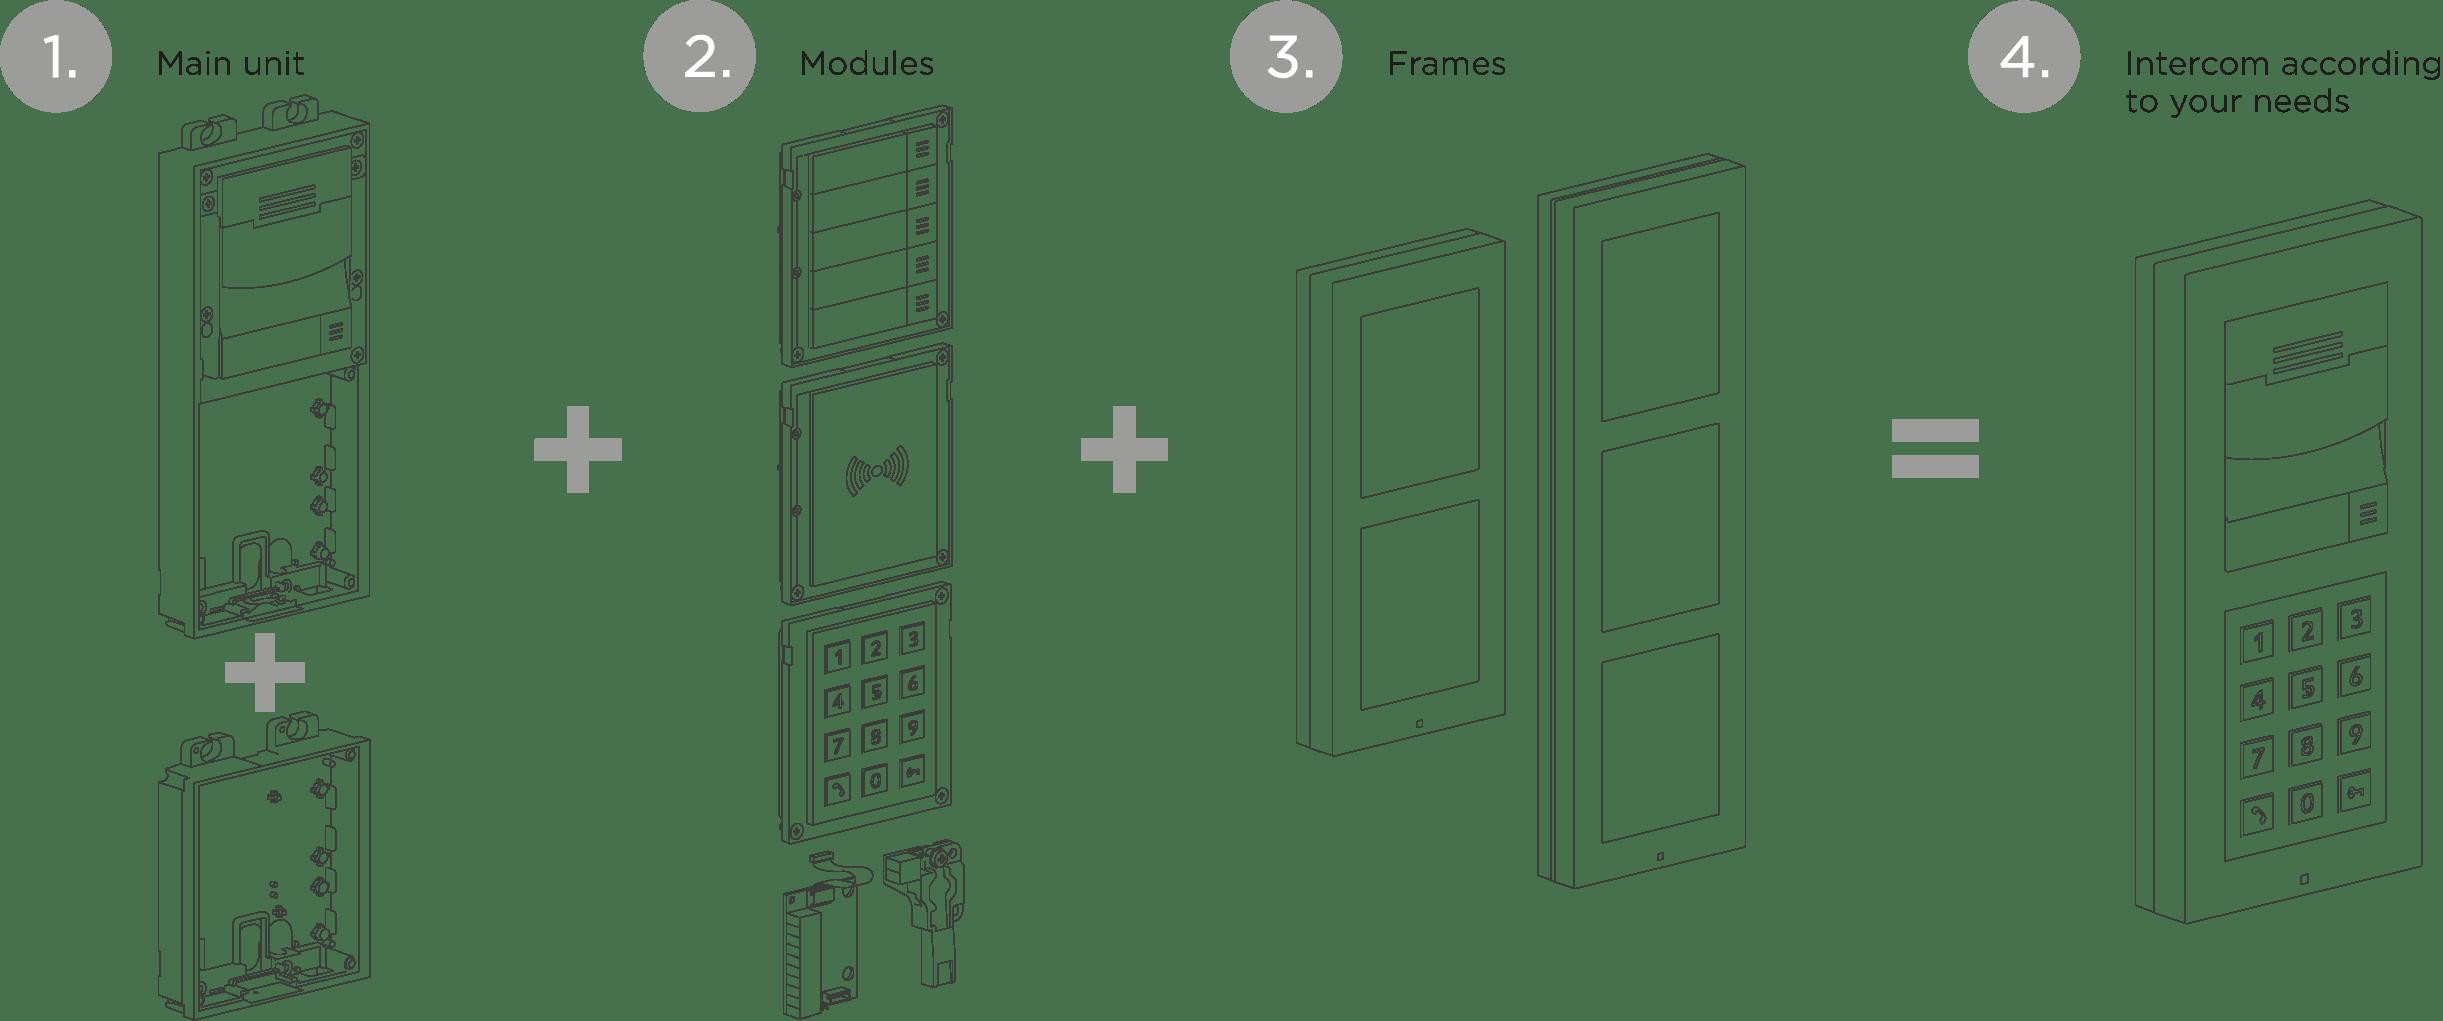 2n Ip Verso Intercom Wiring Diagram Additionally Electrical Circuit Breaker Panel Box Modules